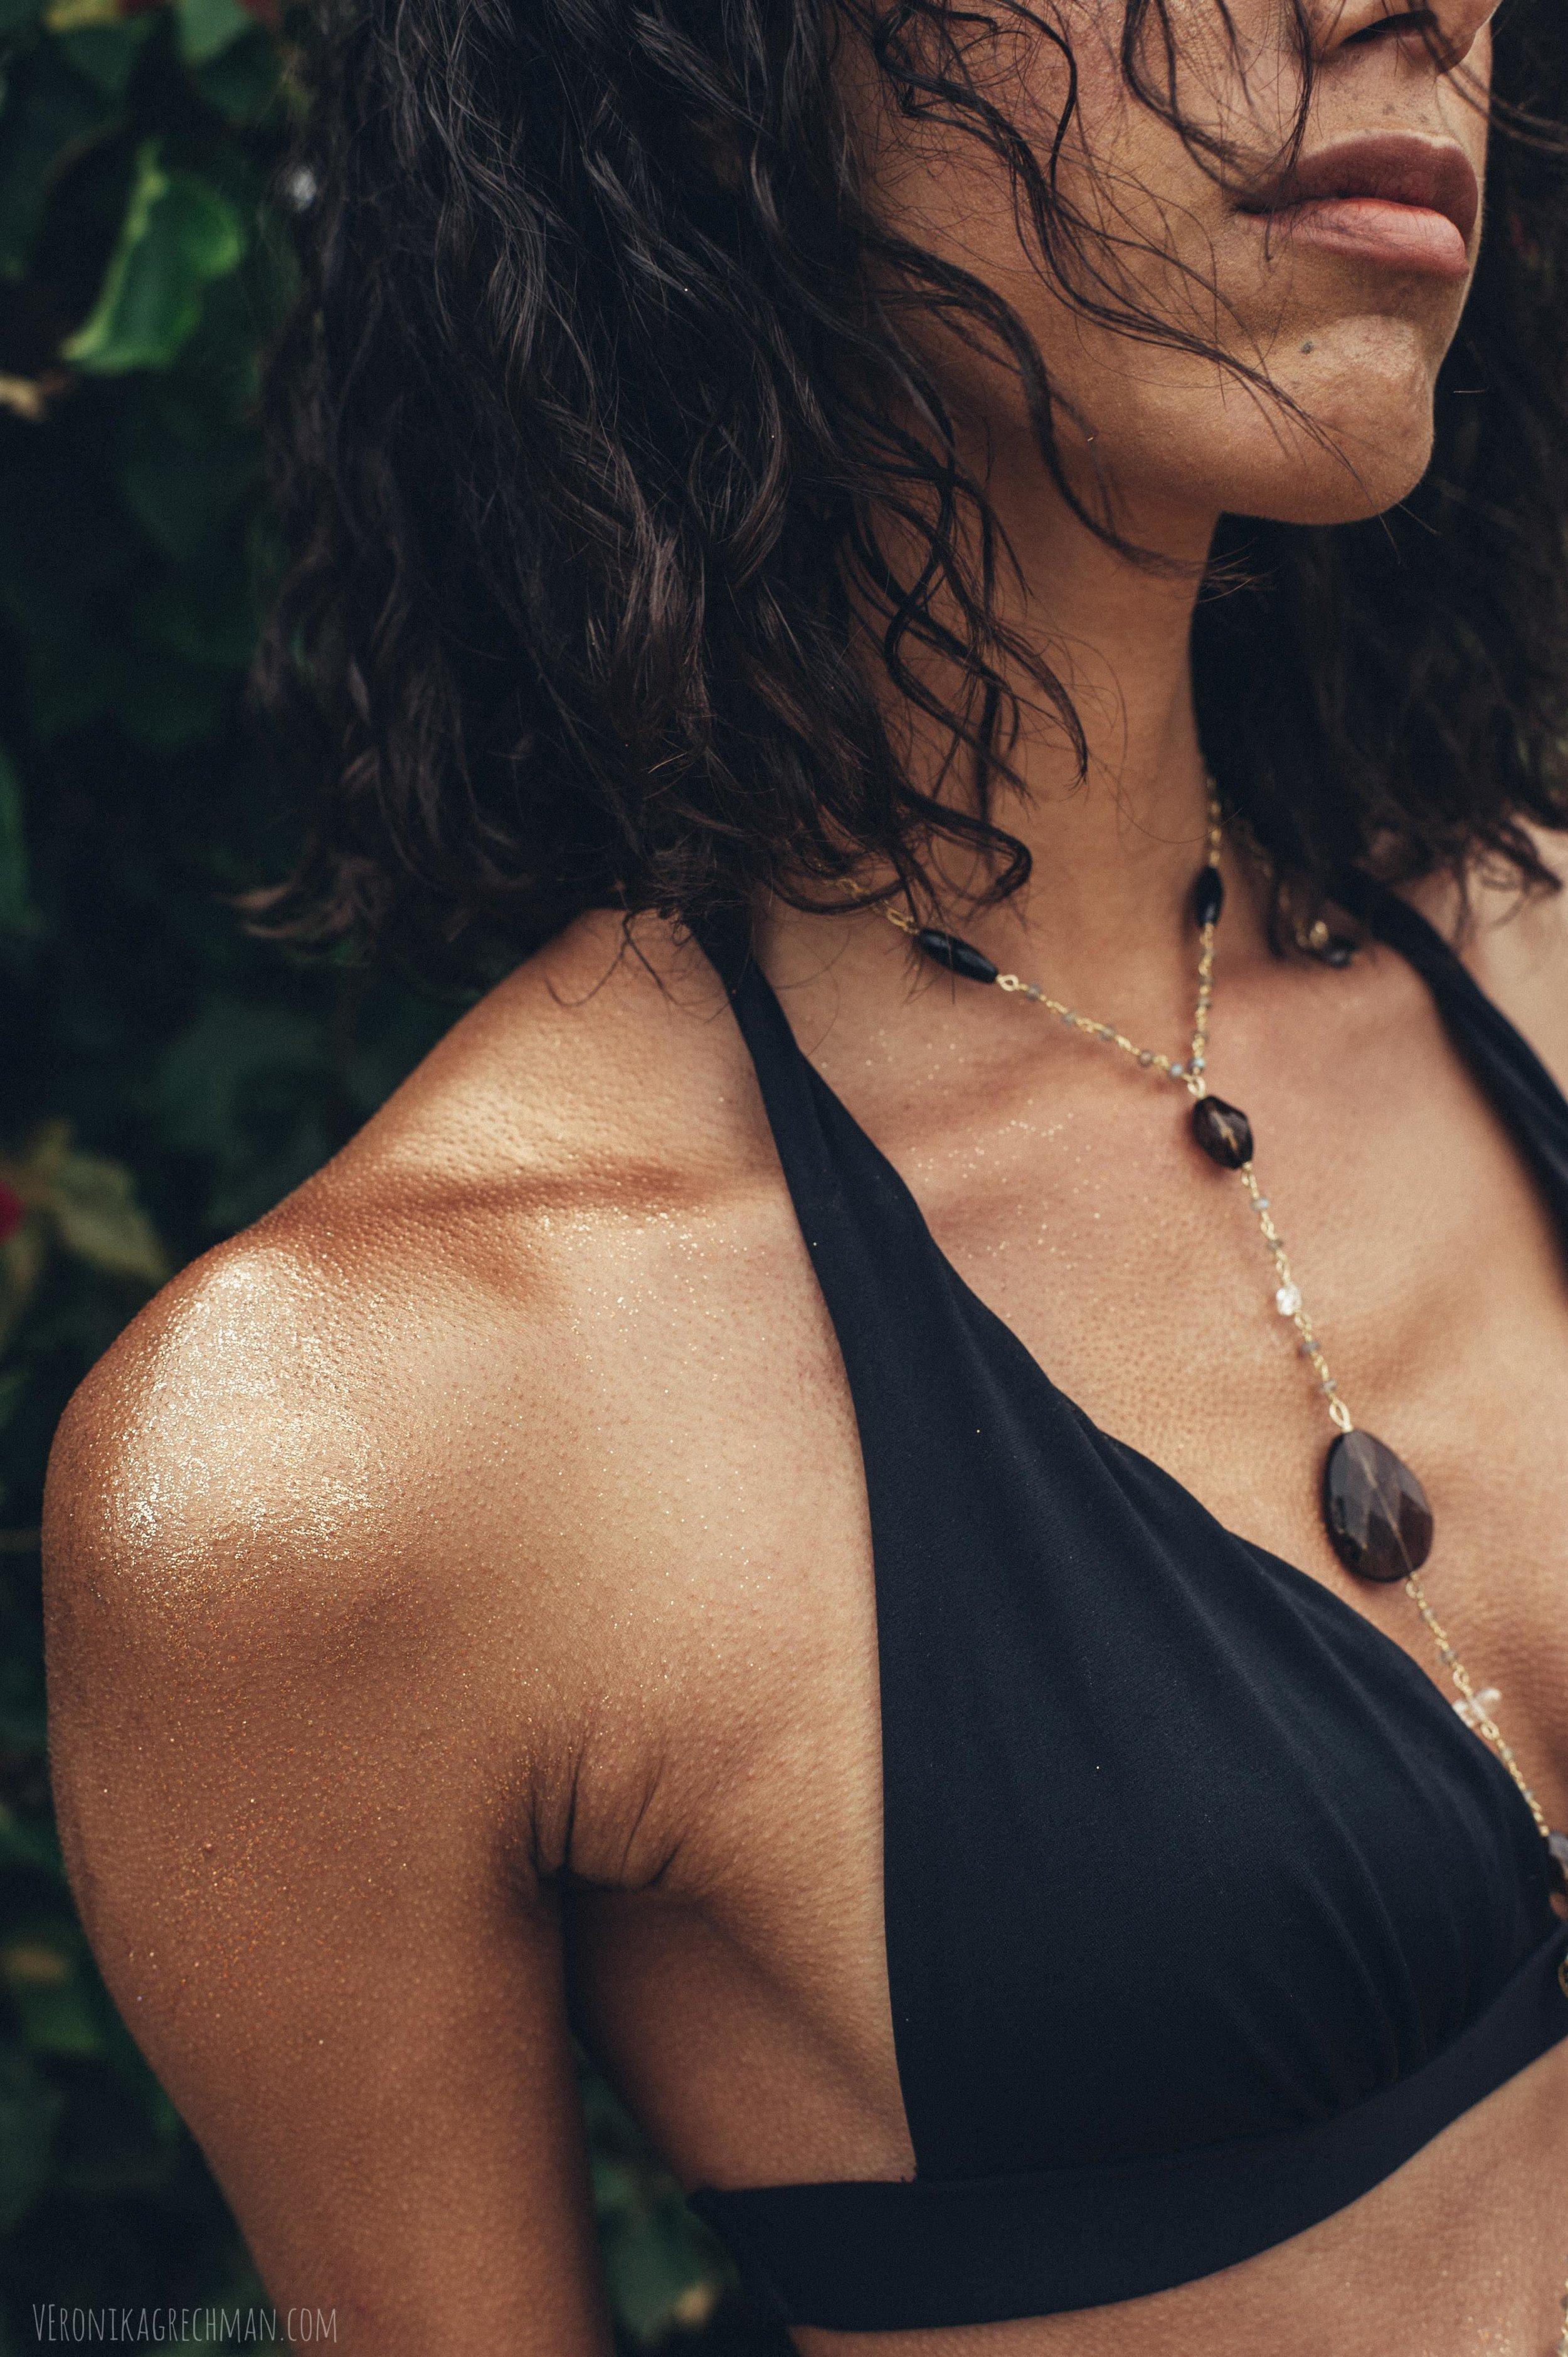 Jewellery photoshoot ideas and inspiration